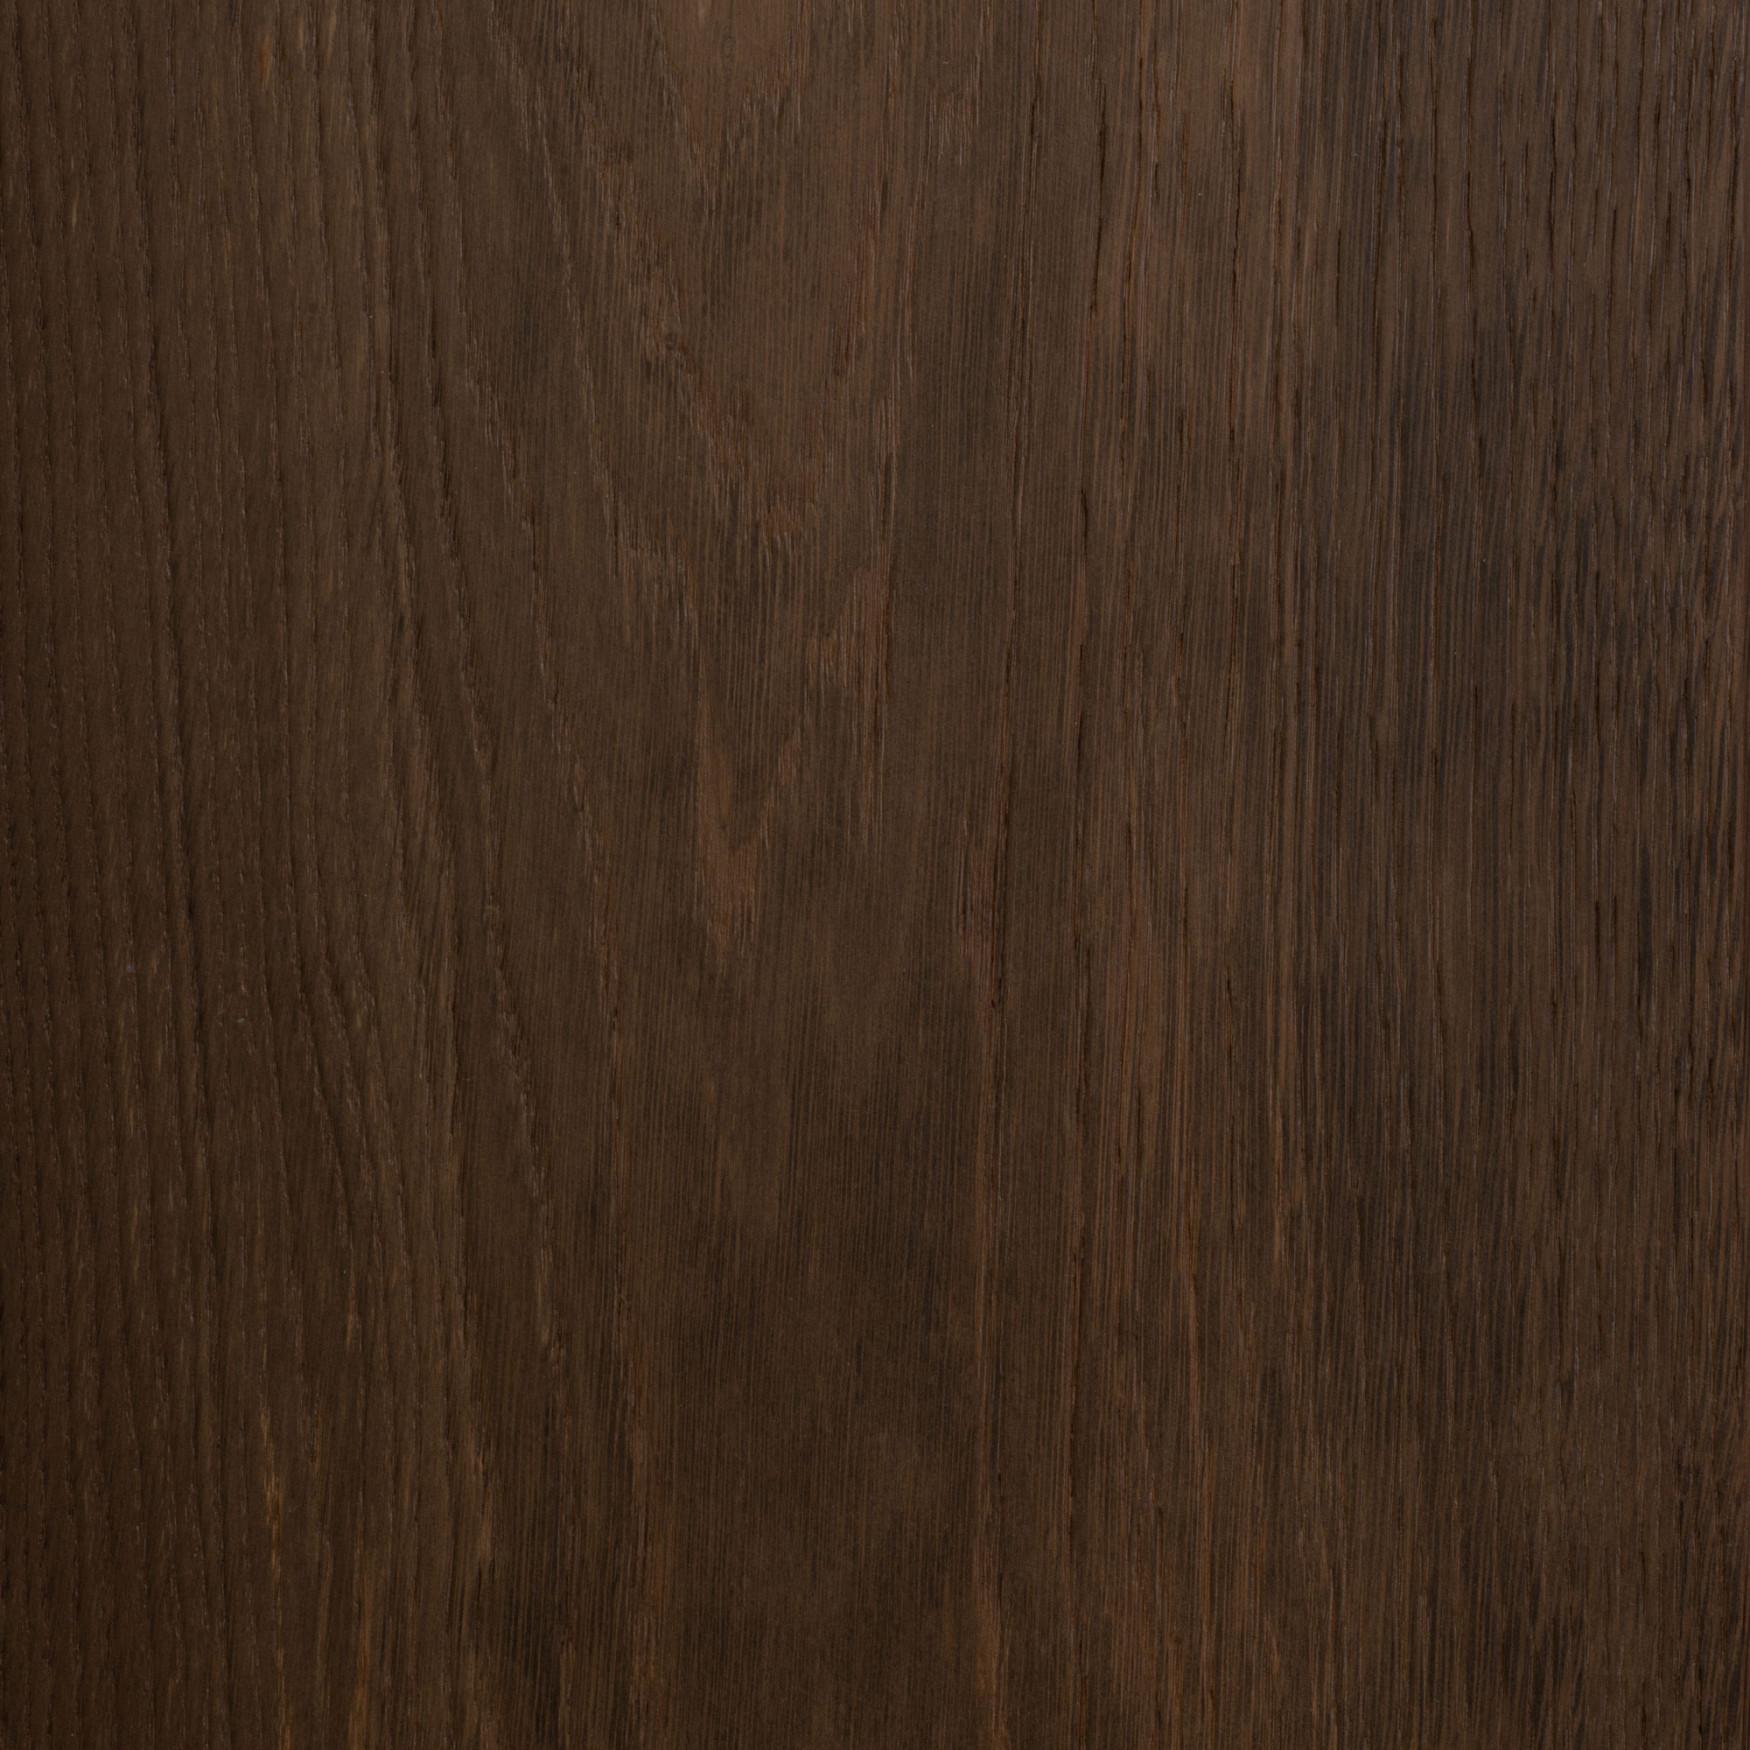 Element7-wide-plank-samples-LIght-Parisian